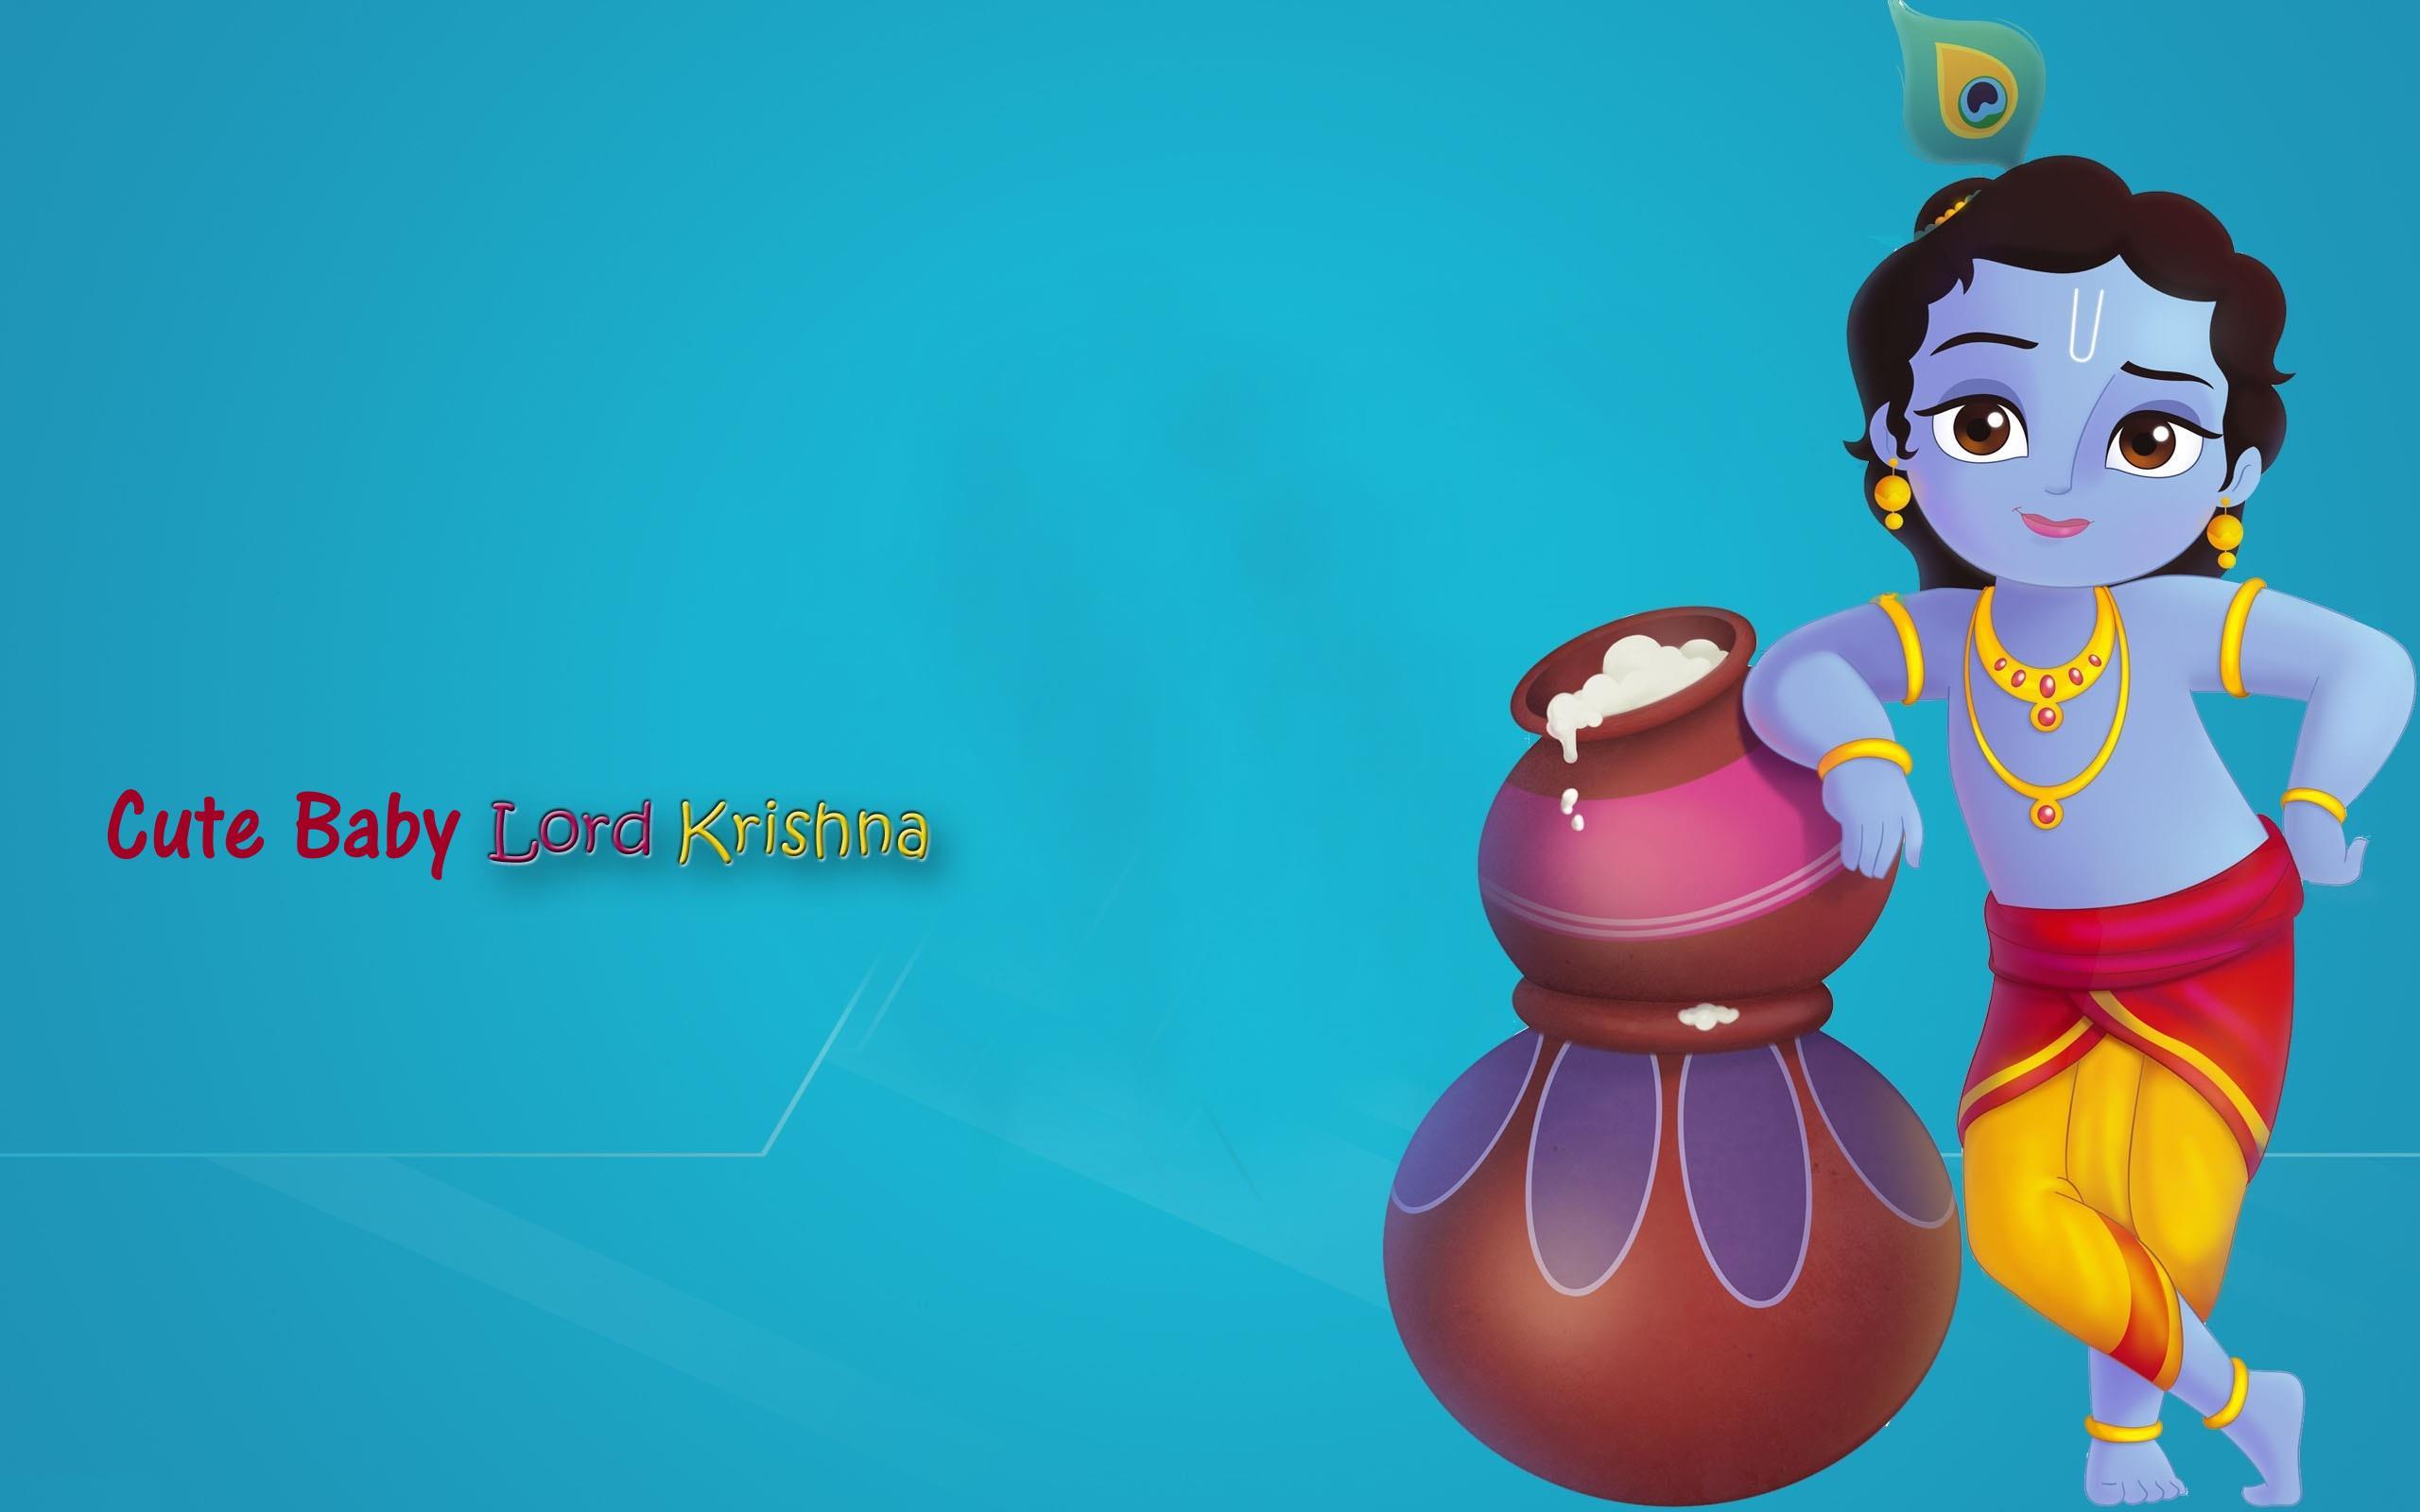 clipart of lord krishna - photo #50